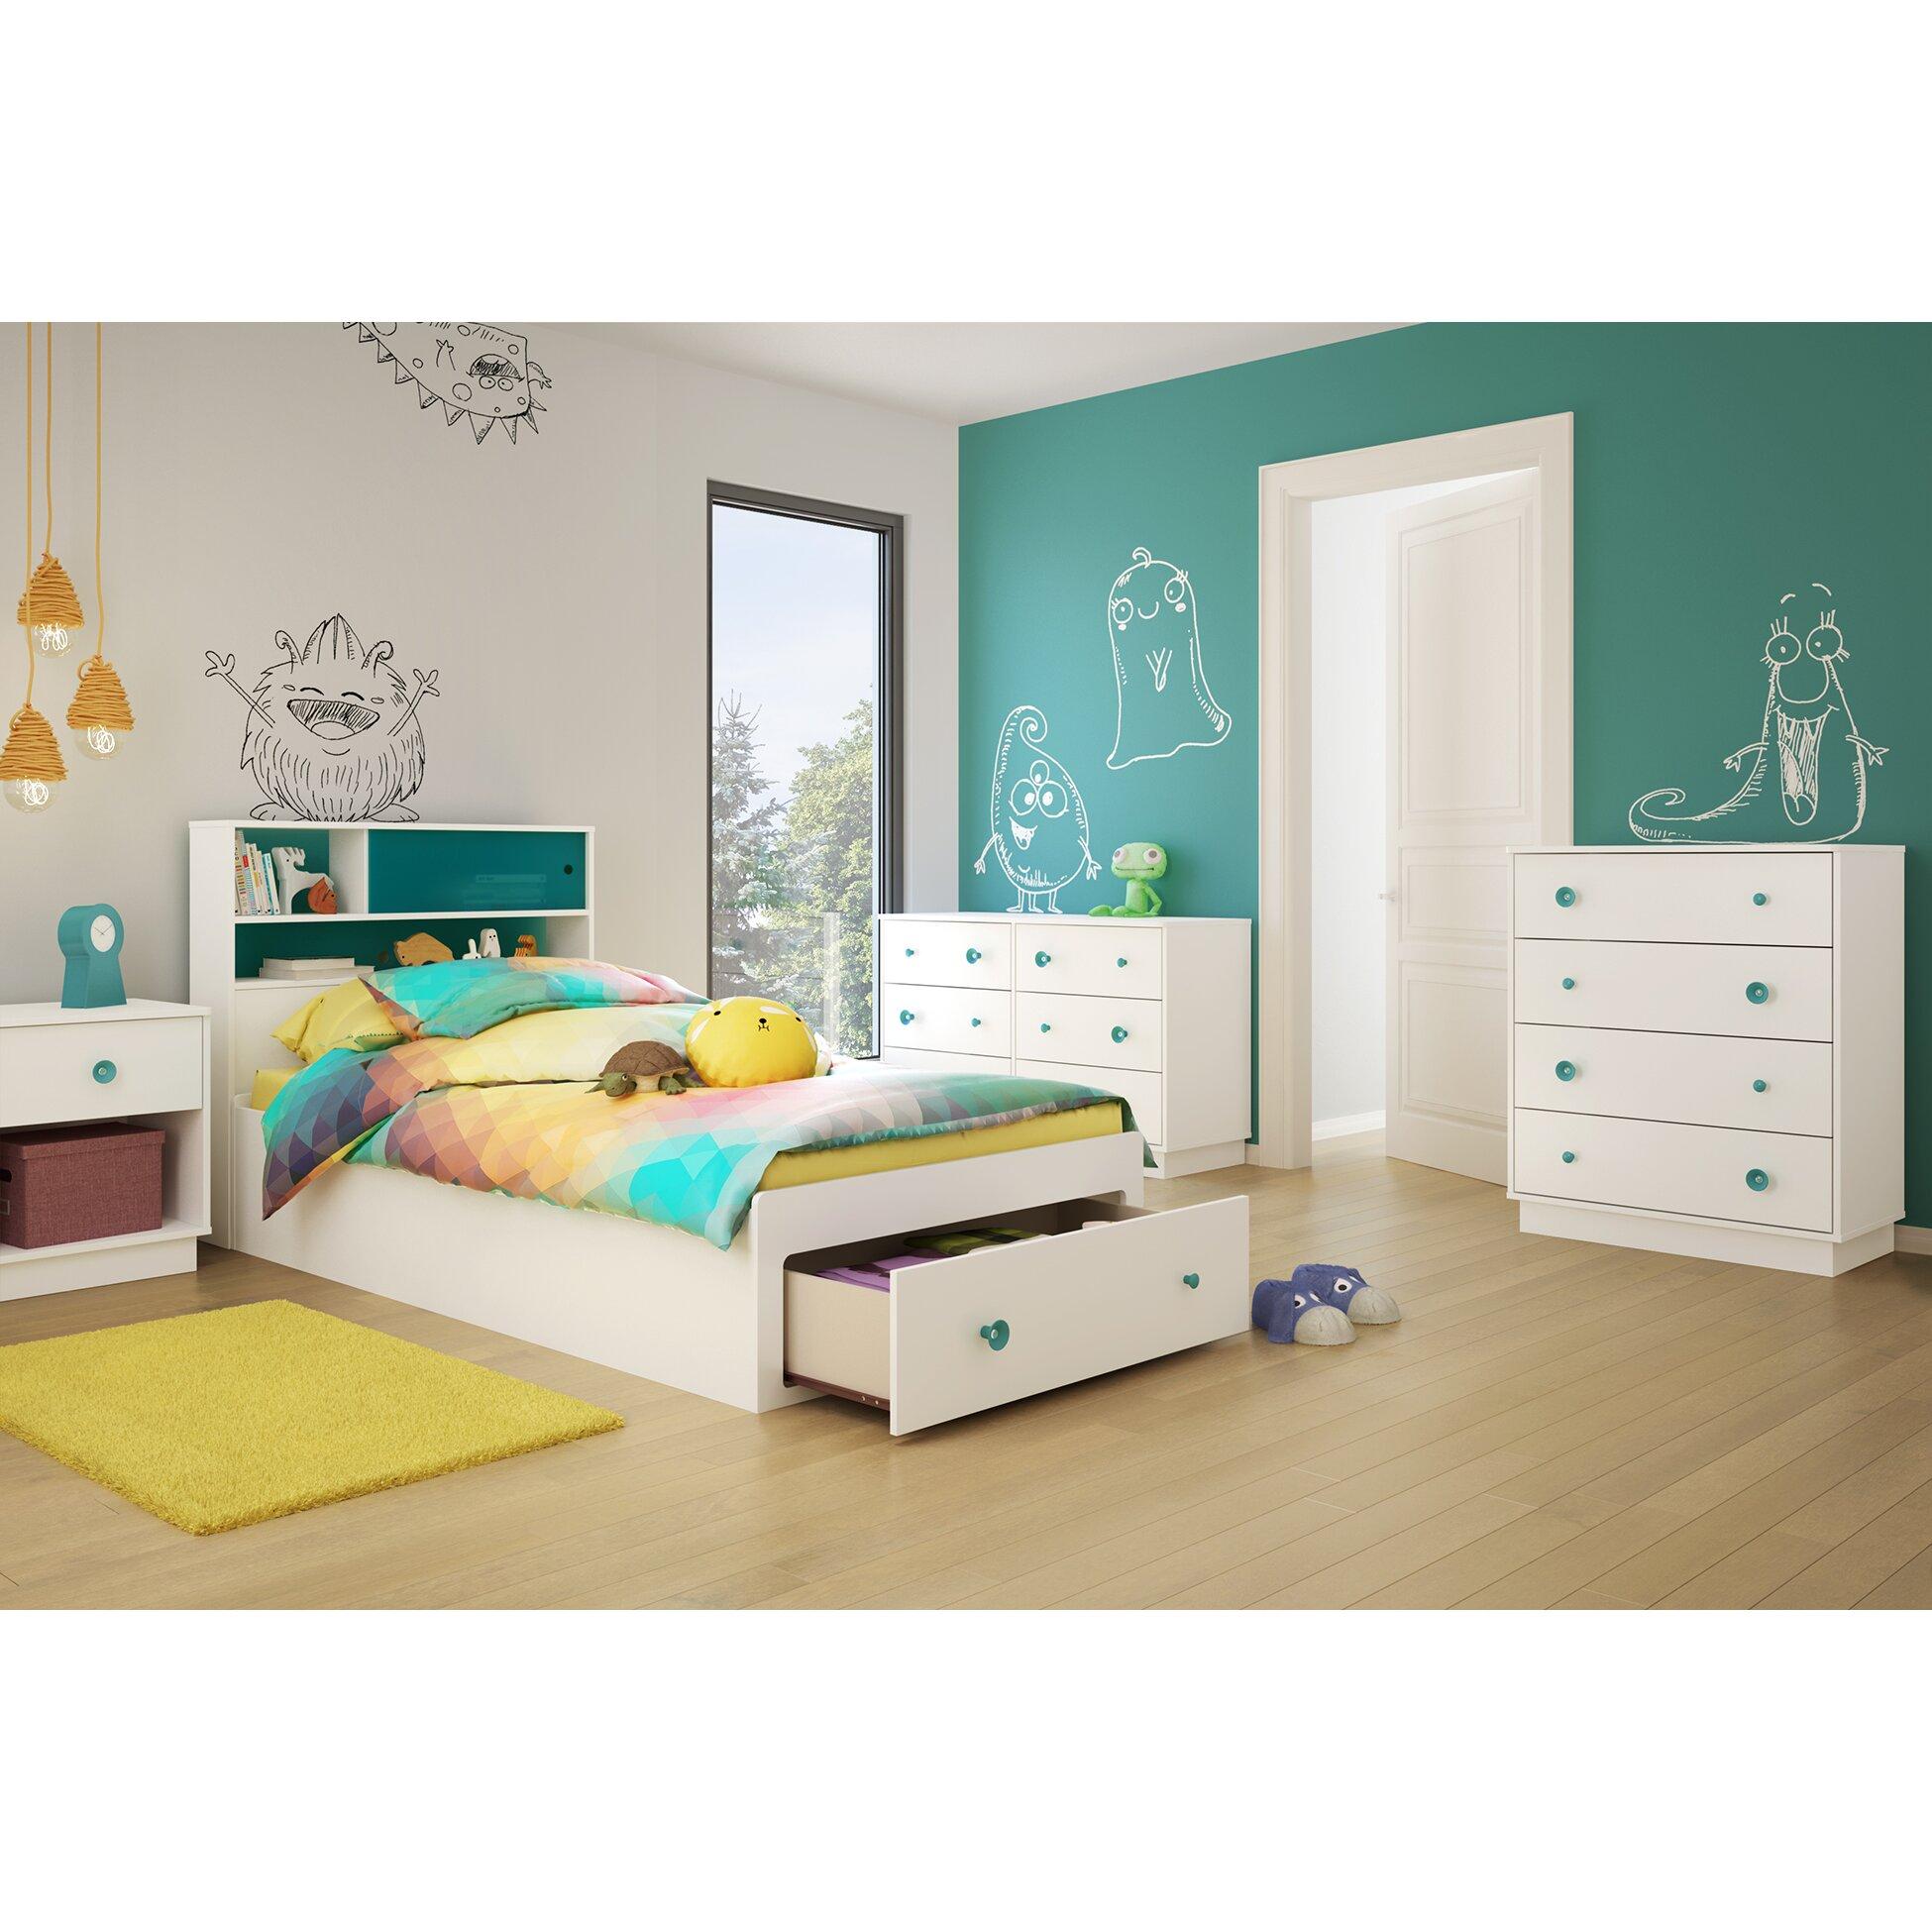 Little Monsters Twin Platform Customizable Bedroom Set. Kids Bedroom Sets   Shop Sets for Boys and Girls You ll Love   Wayfair